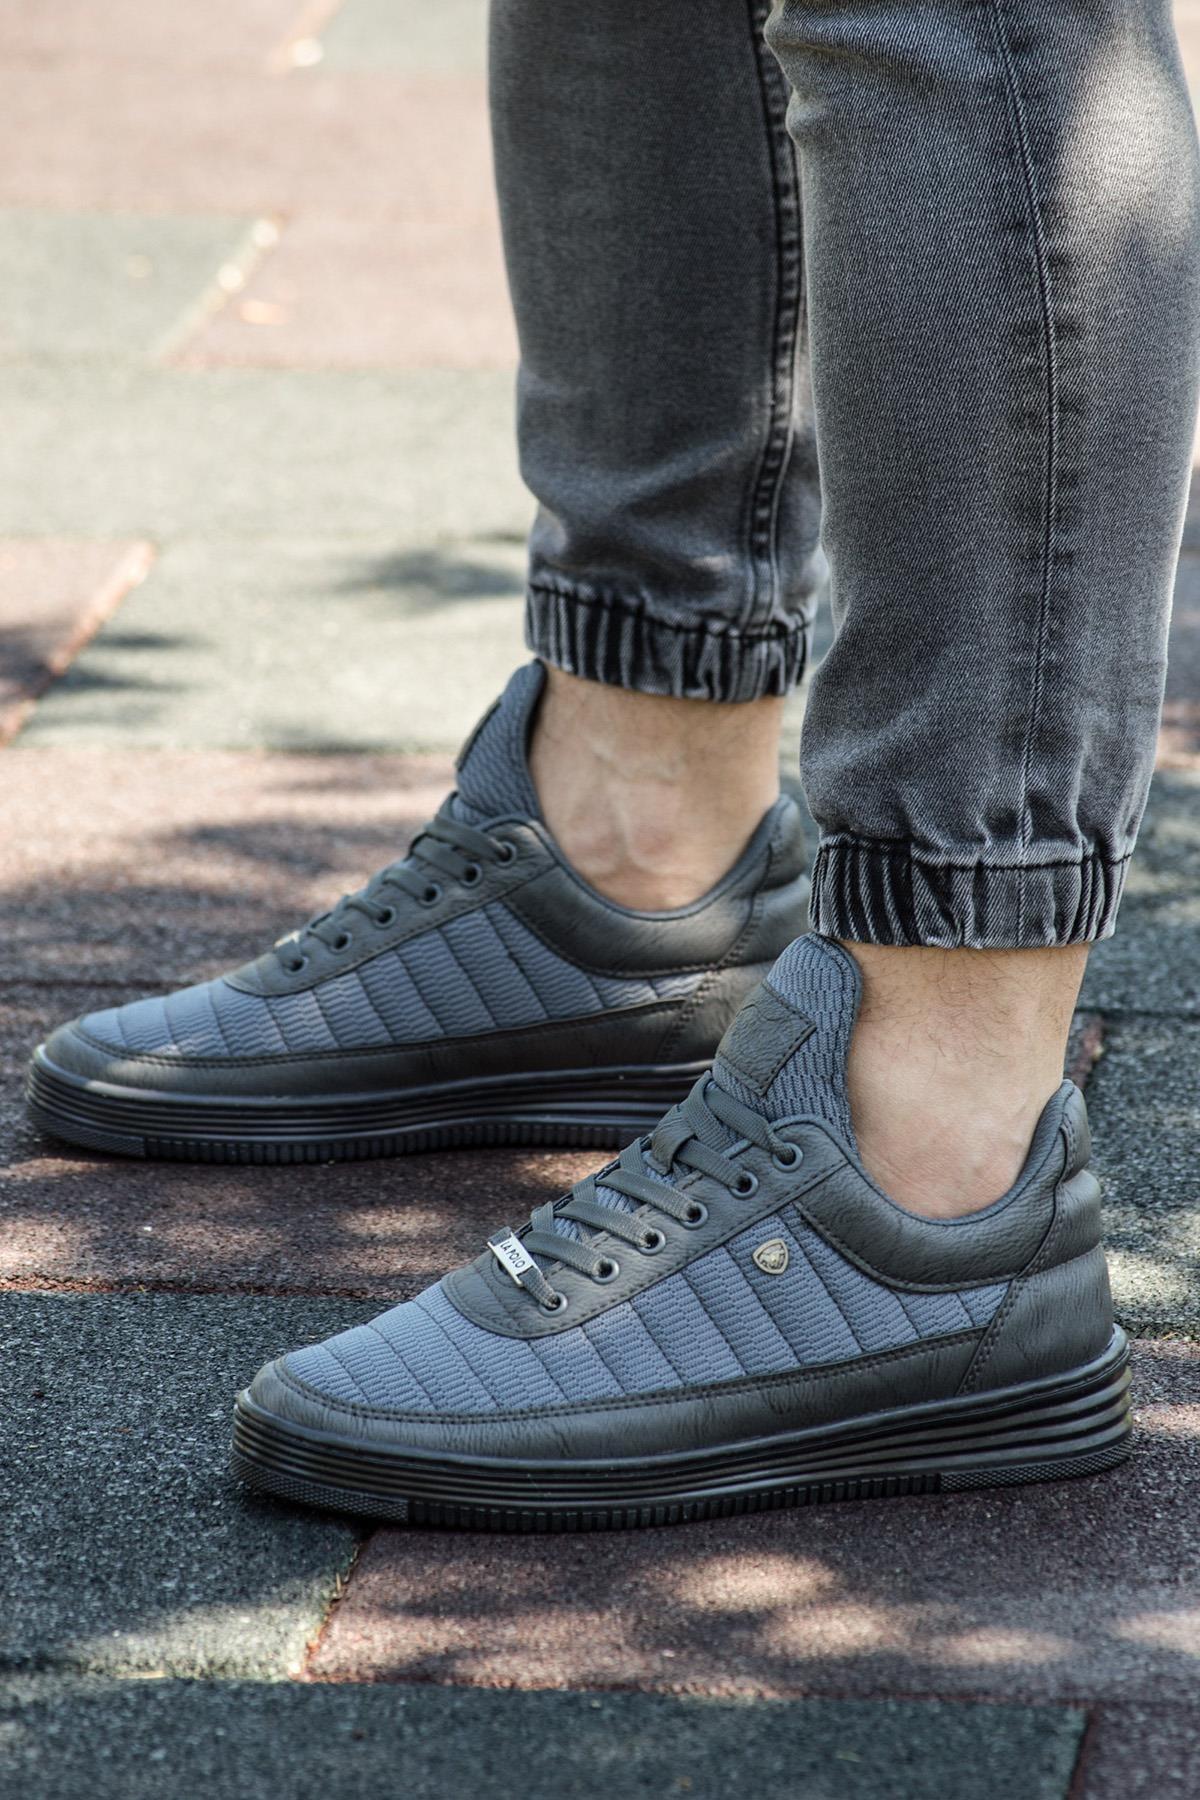 077 Füme Siyah Summer Erkek Spor Ayakkabı